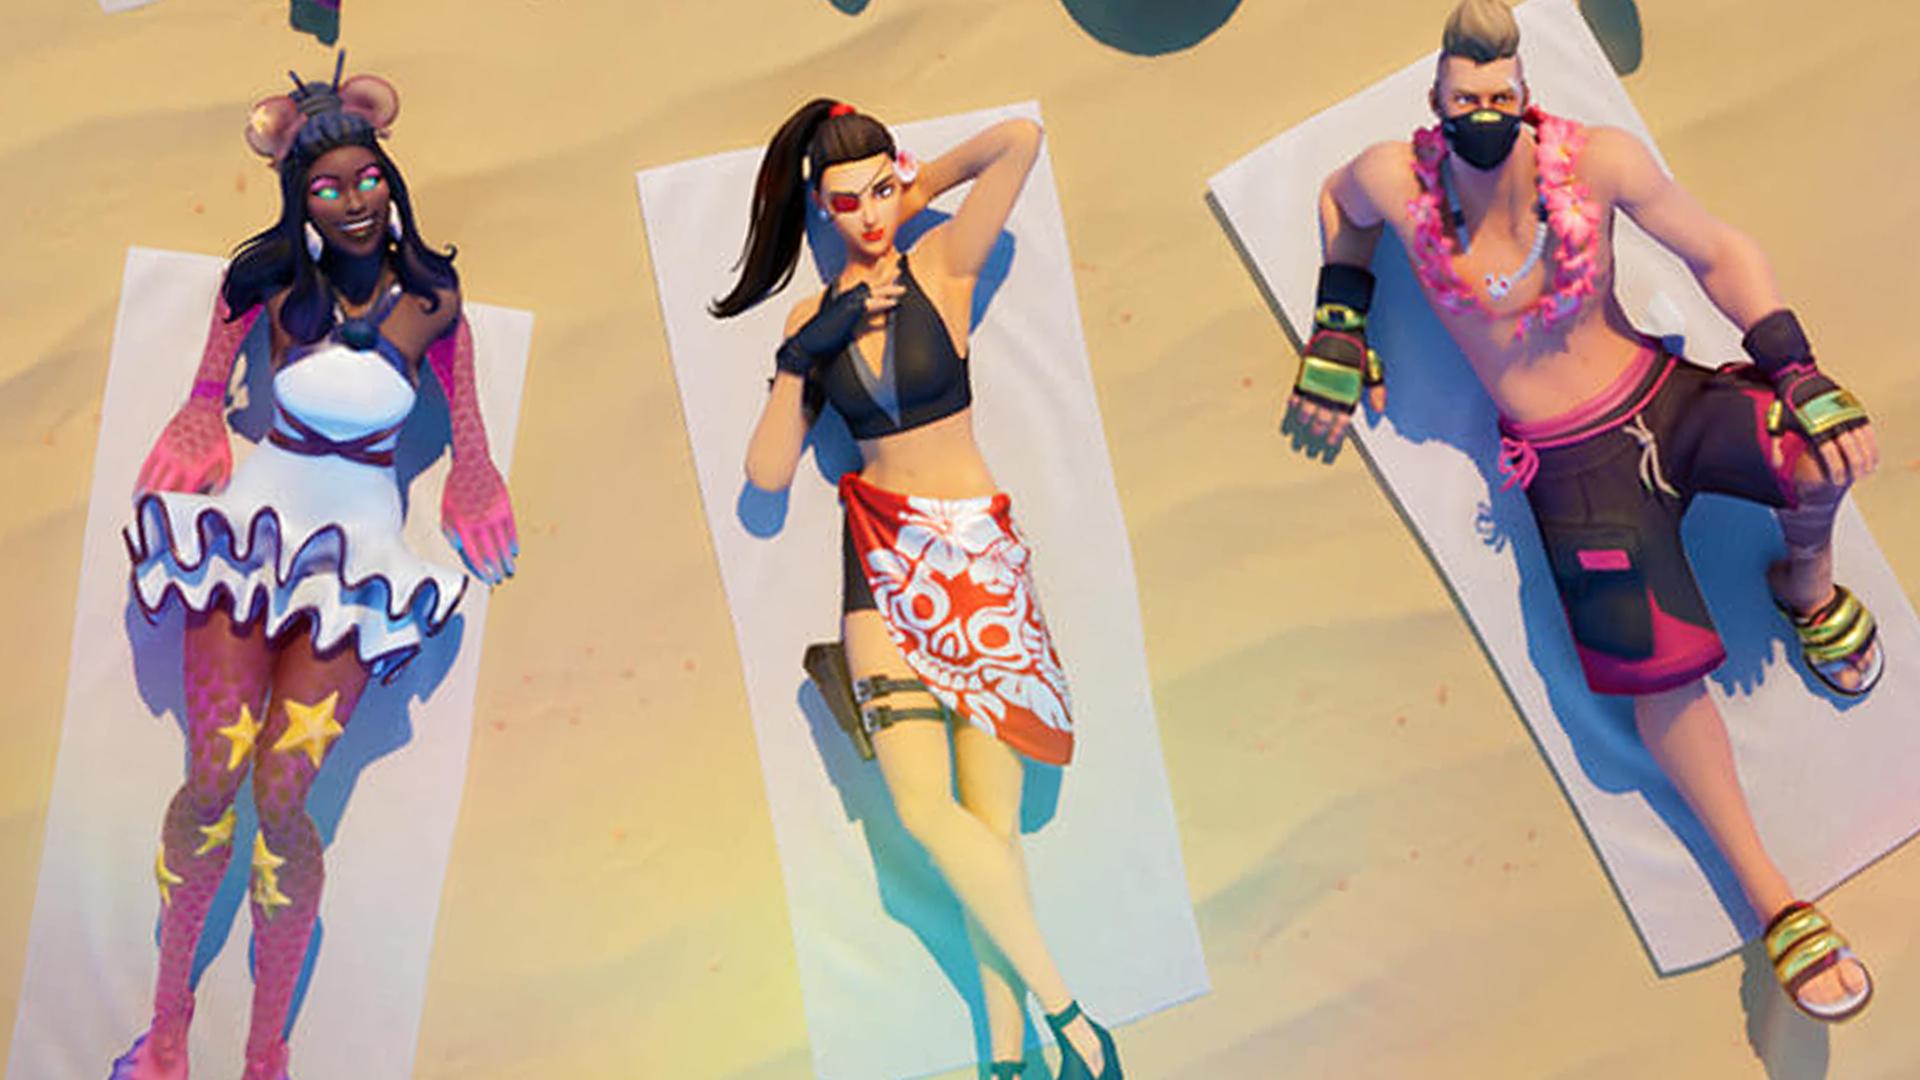 PC Games PCGamesN On Flipboard By PCGamesN South Korea Final Fantasy VII Remake Mythology